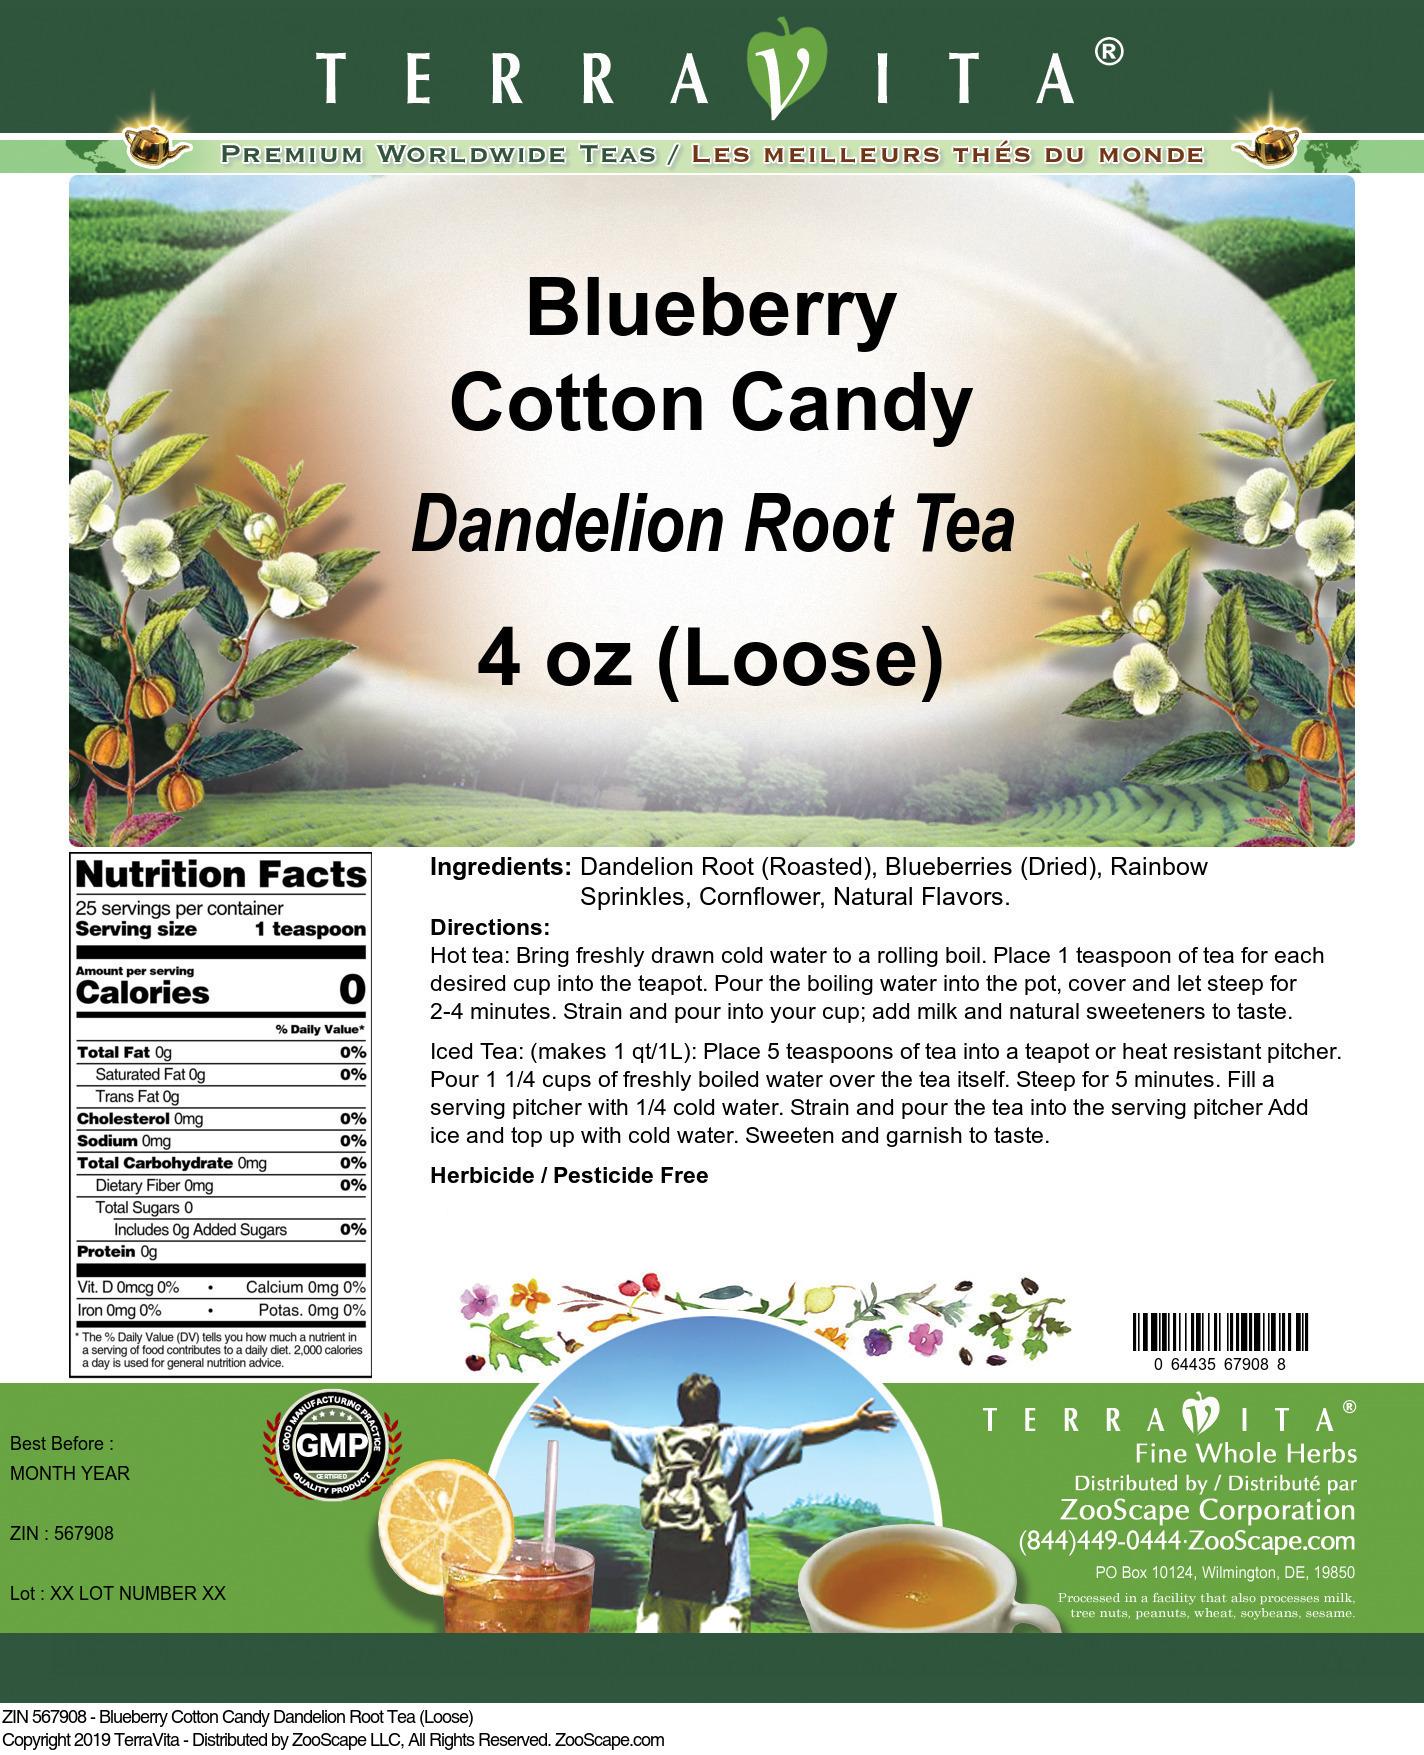 Blueberry Cotton Candy Dandelion Root Tea (Loose)